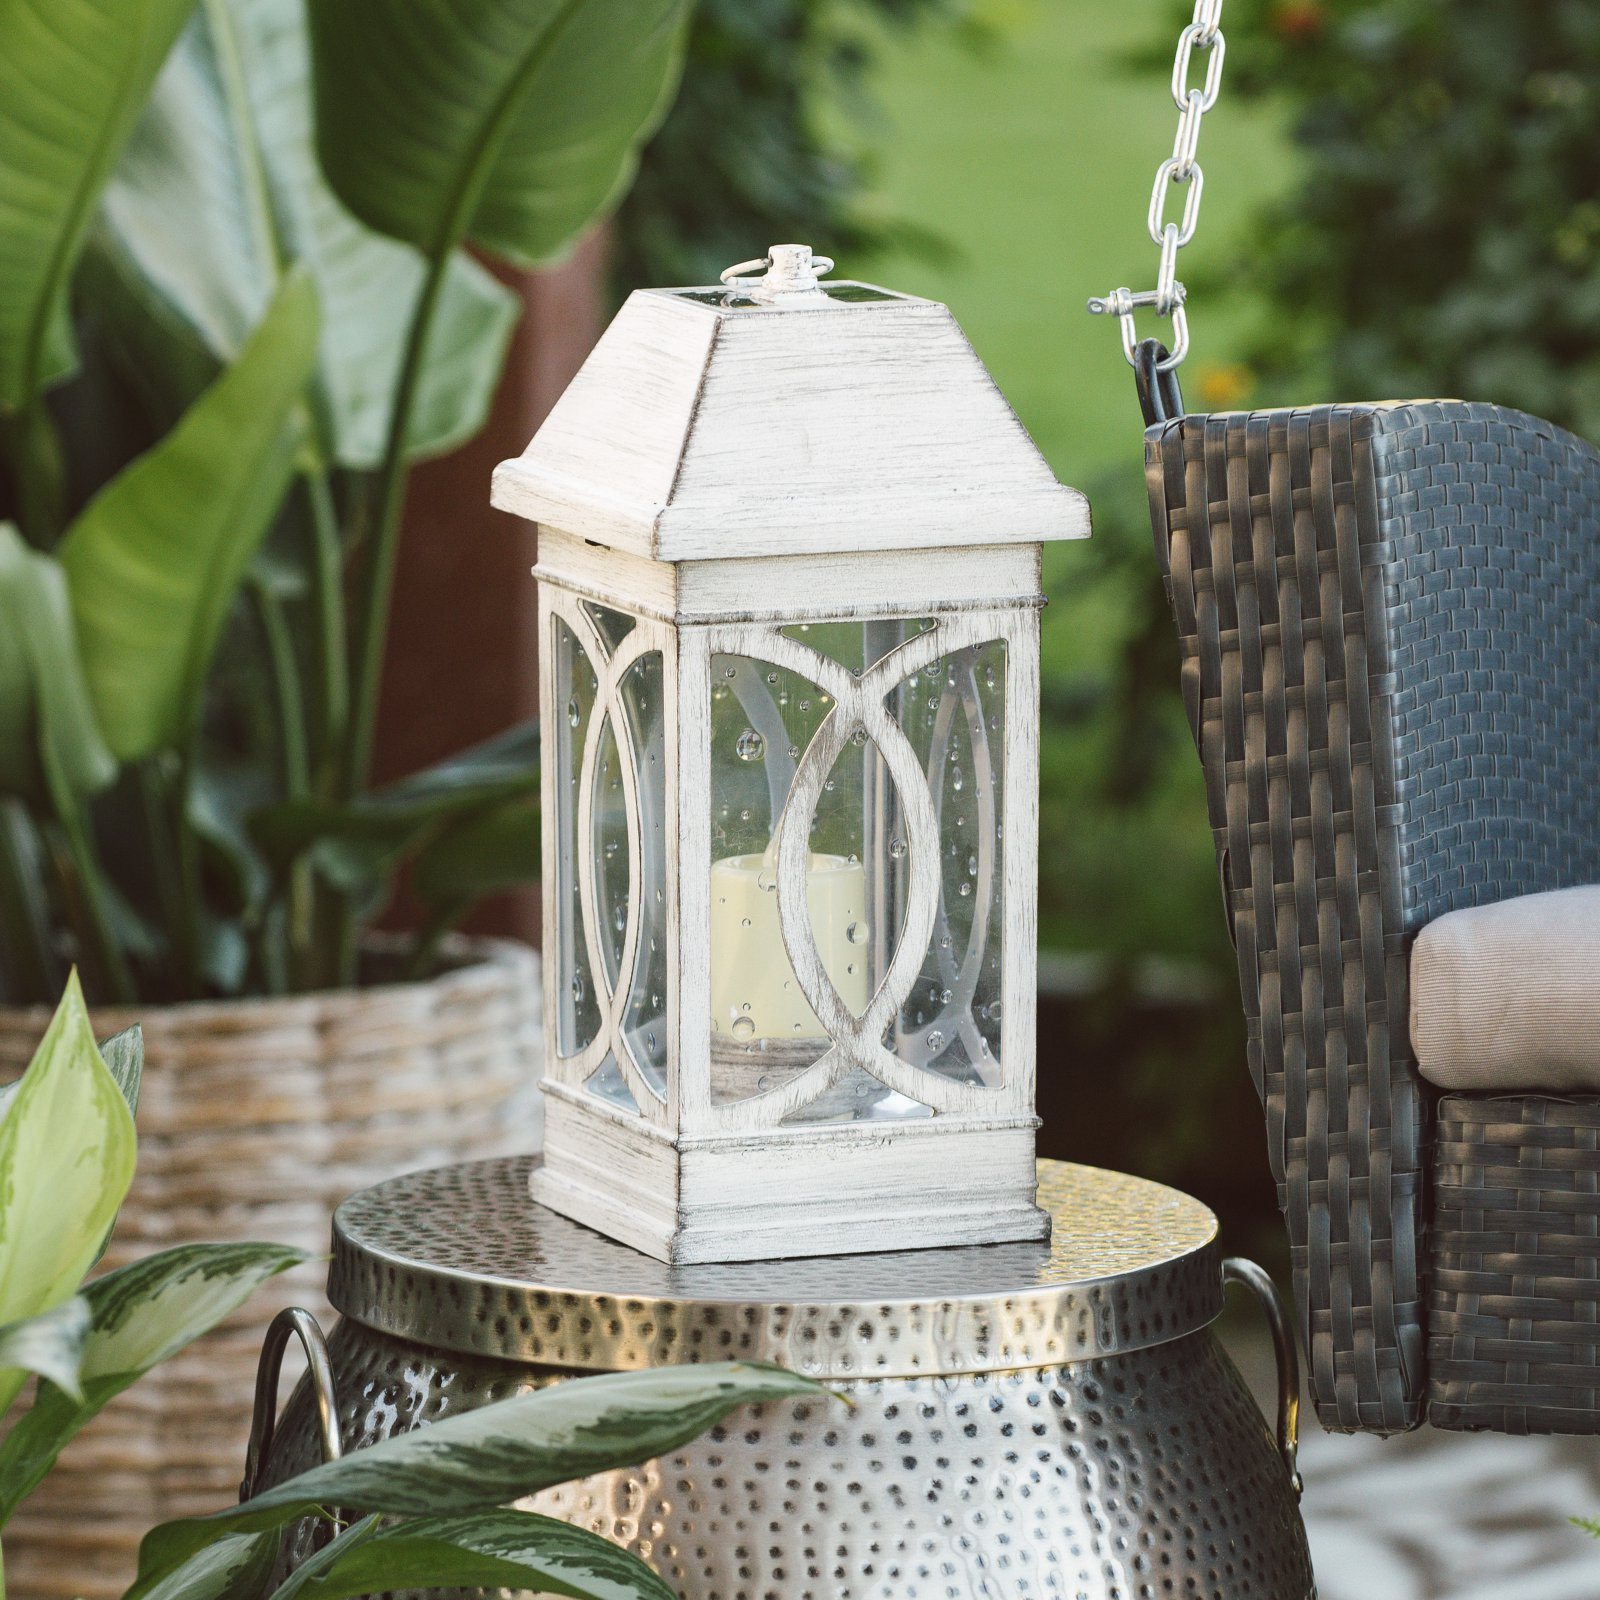 Belham Living San Vicente Estate Solar Lantern 15 in. - Distressed White